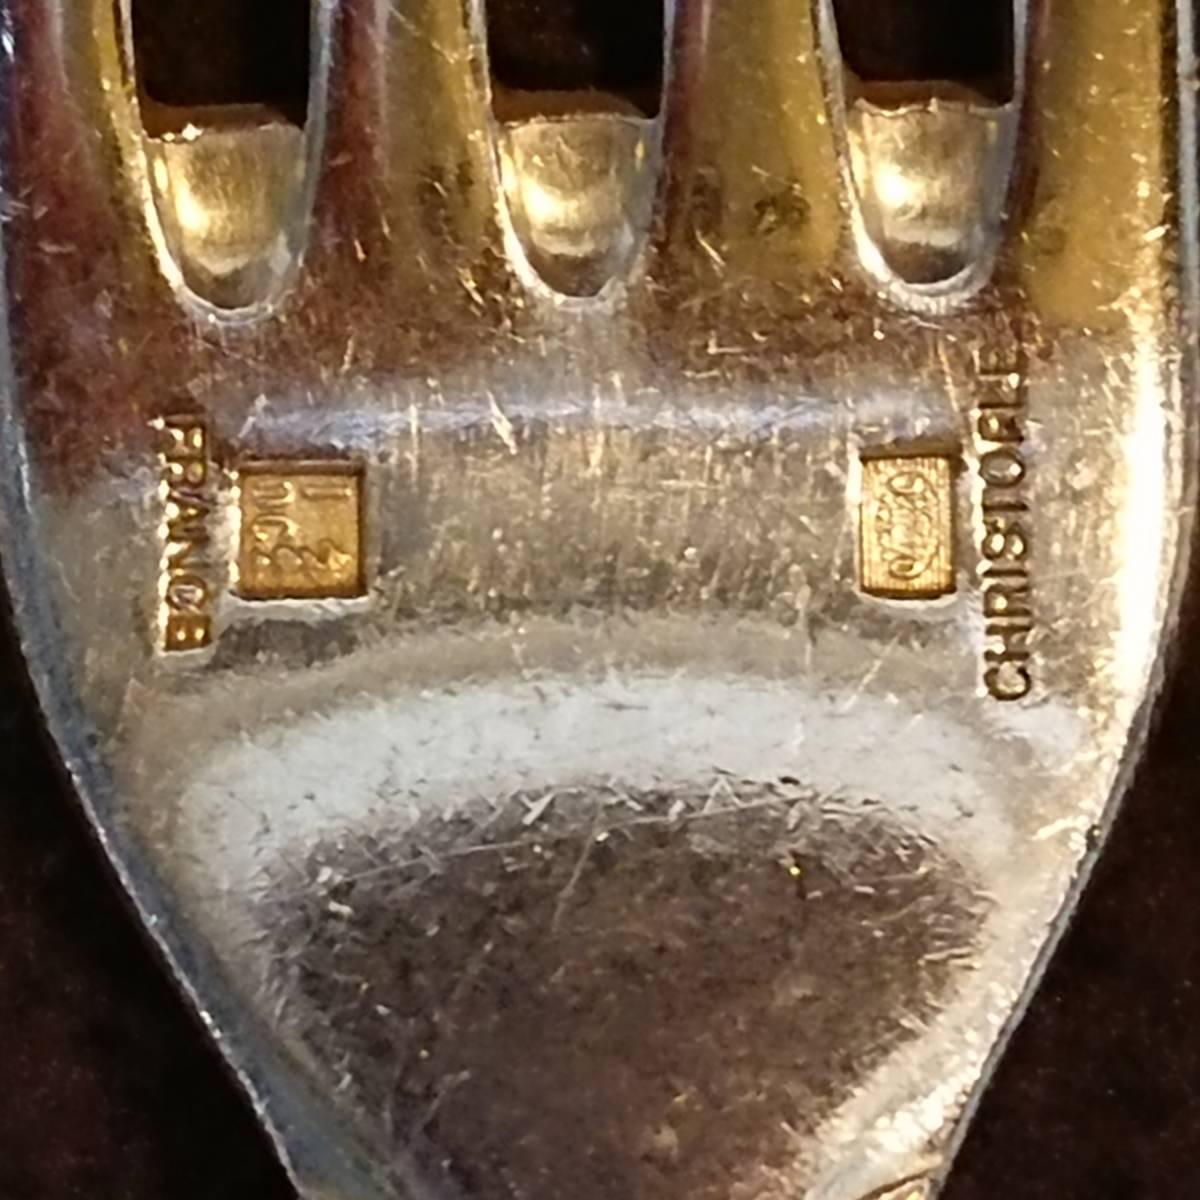 Cクリストフル フランス カトラリーセット パールシリーズ ナイフ&フォーク 各4本セット クリストフルシルバー 刻印あり_画像8